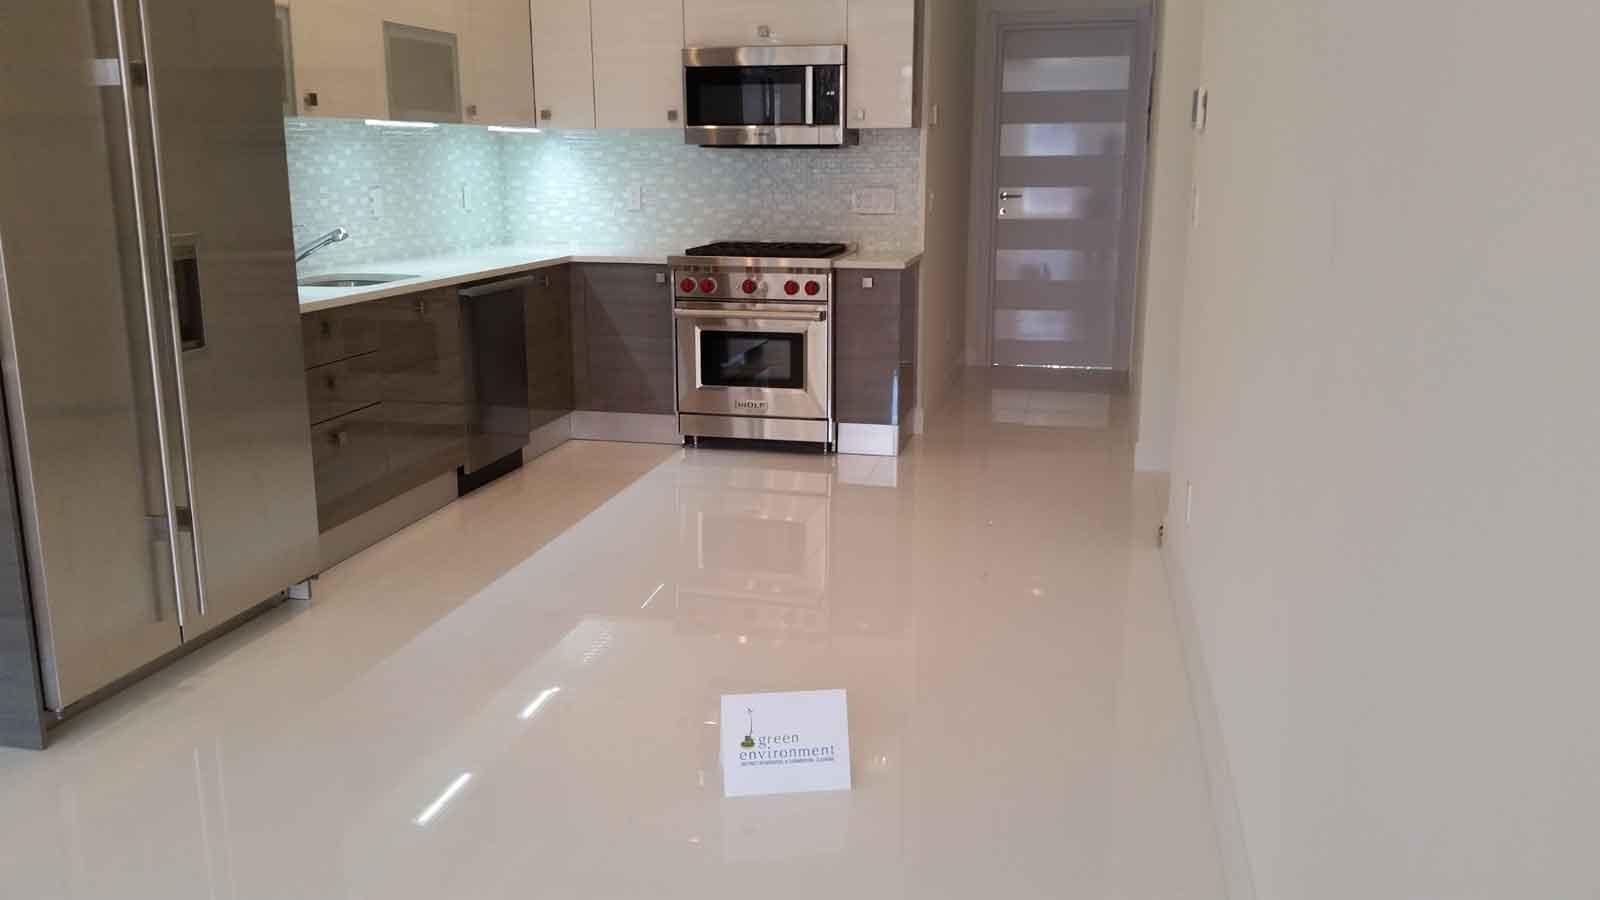 Recently remodeled kitchen with tile backsplash and custom cabinets.